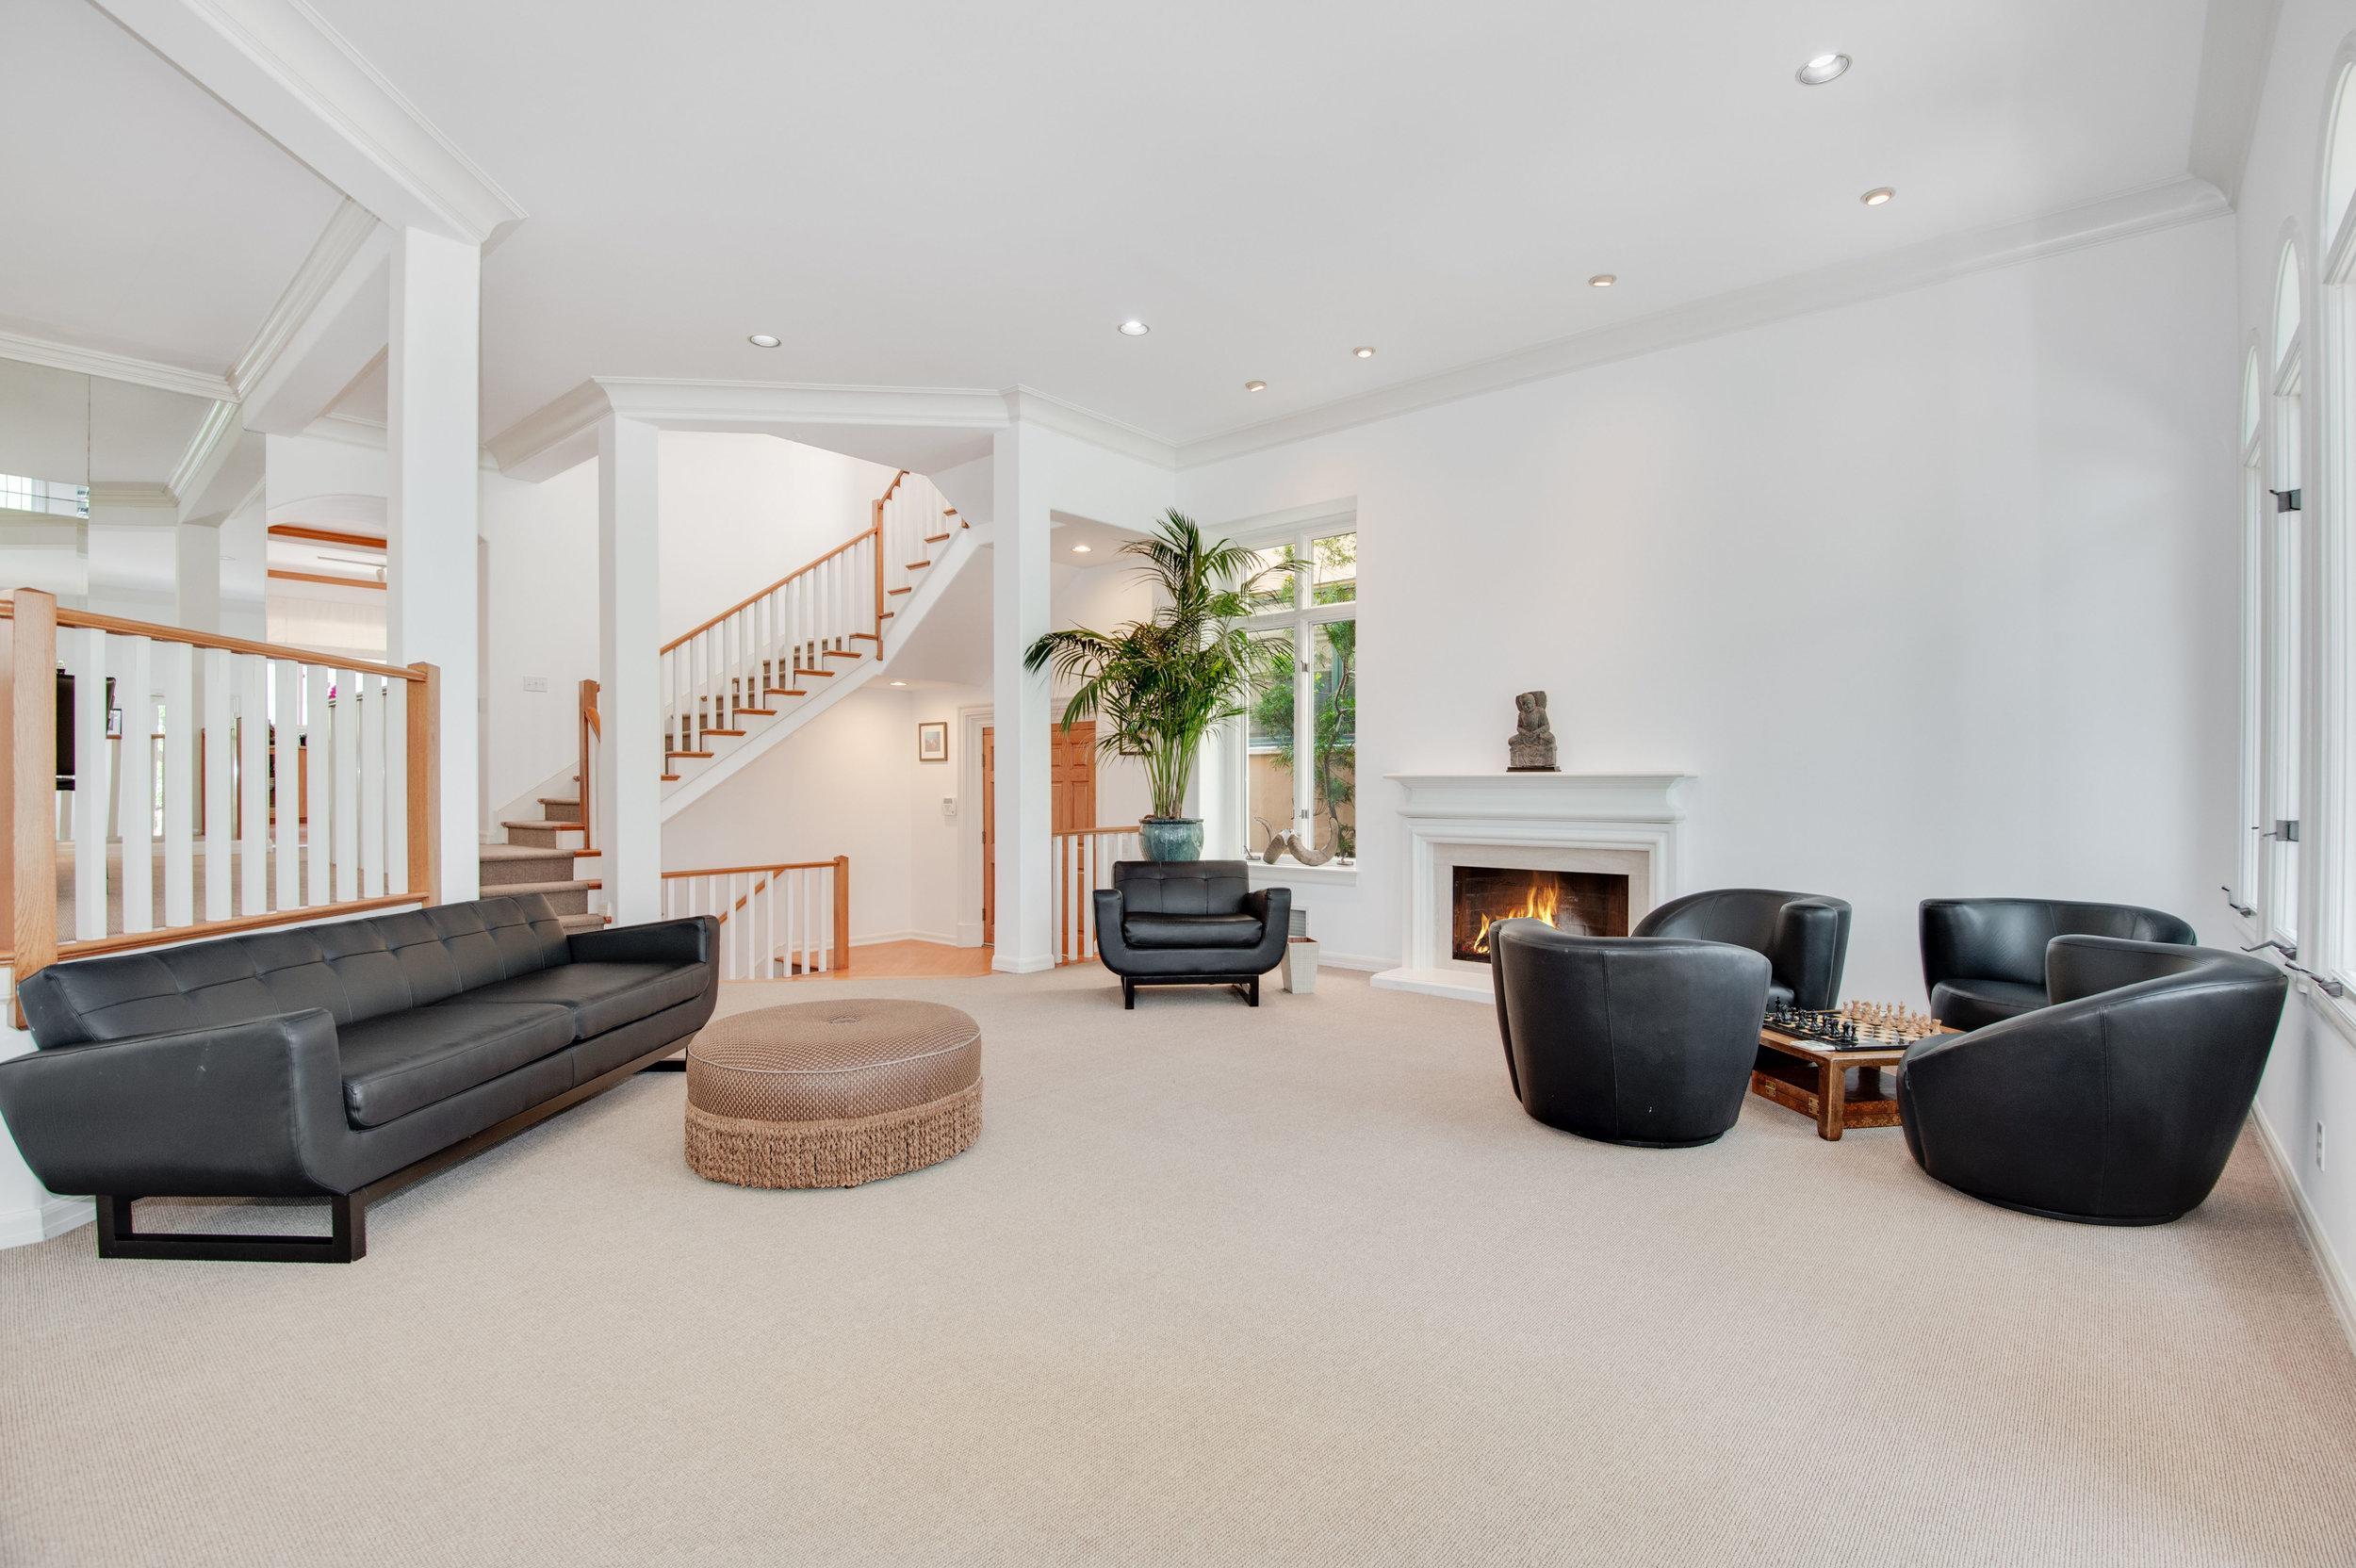 003 Living Room Malibu For Sale Lease The Malibu Life Team Luxury Real Estate.jpg